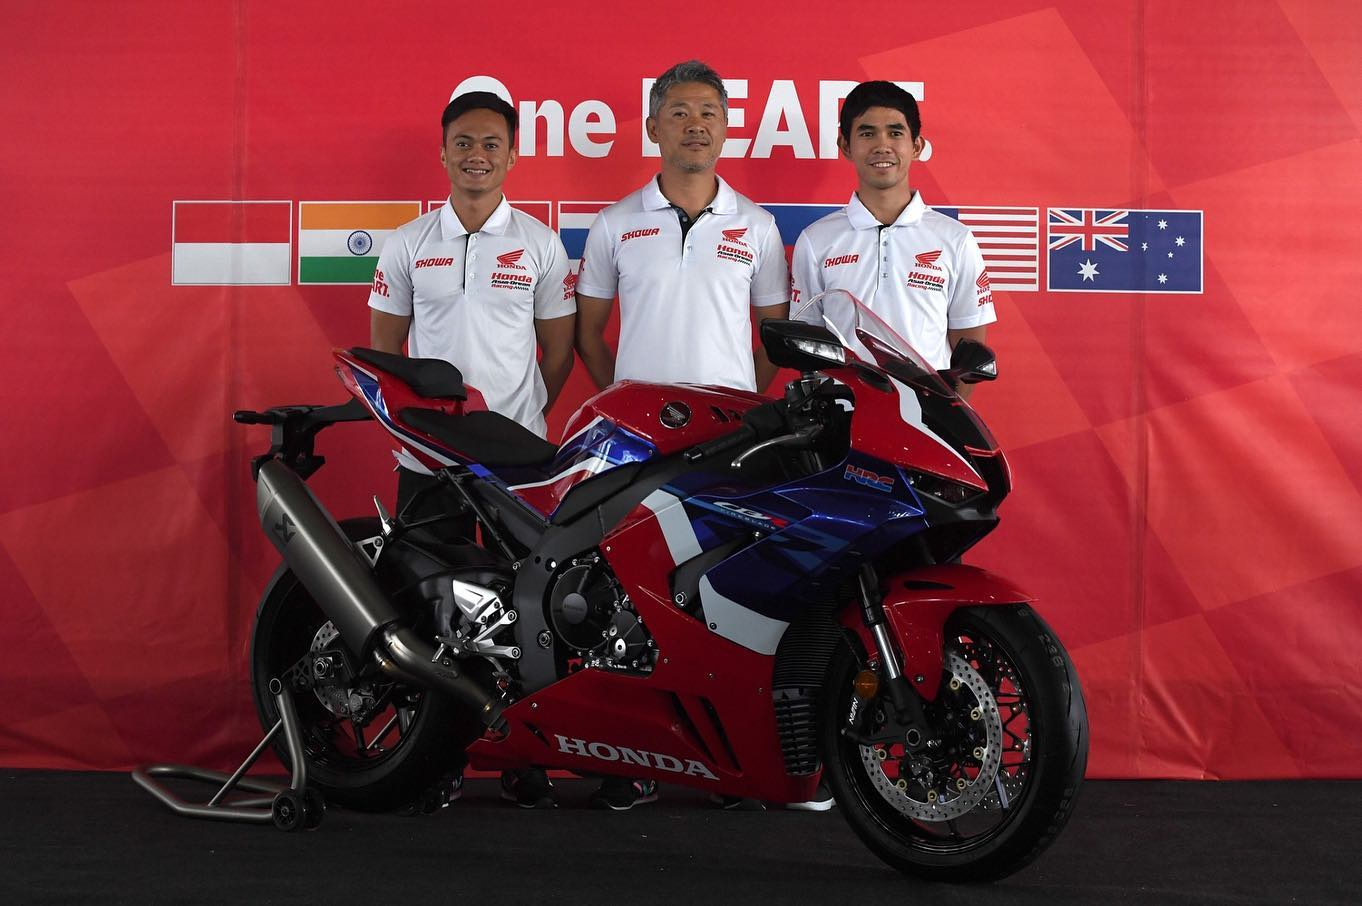 honda-asia-dream-racing-1.jpg